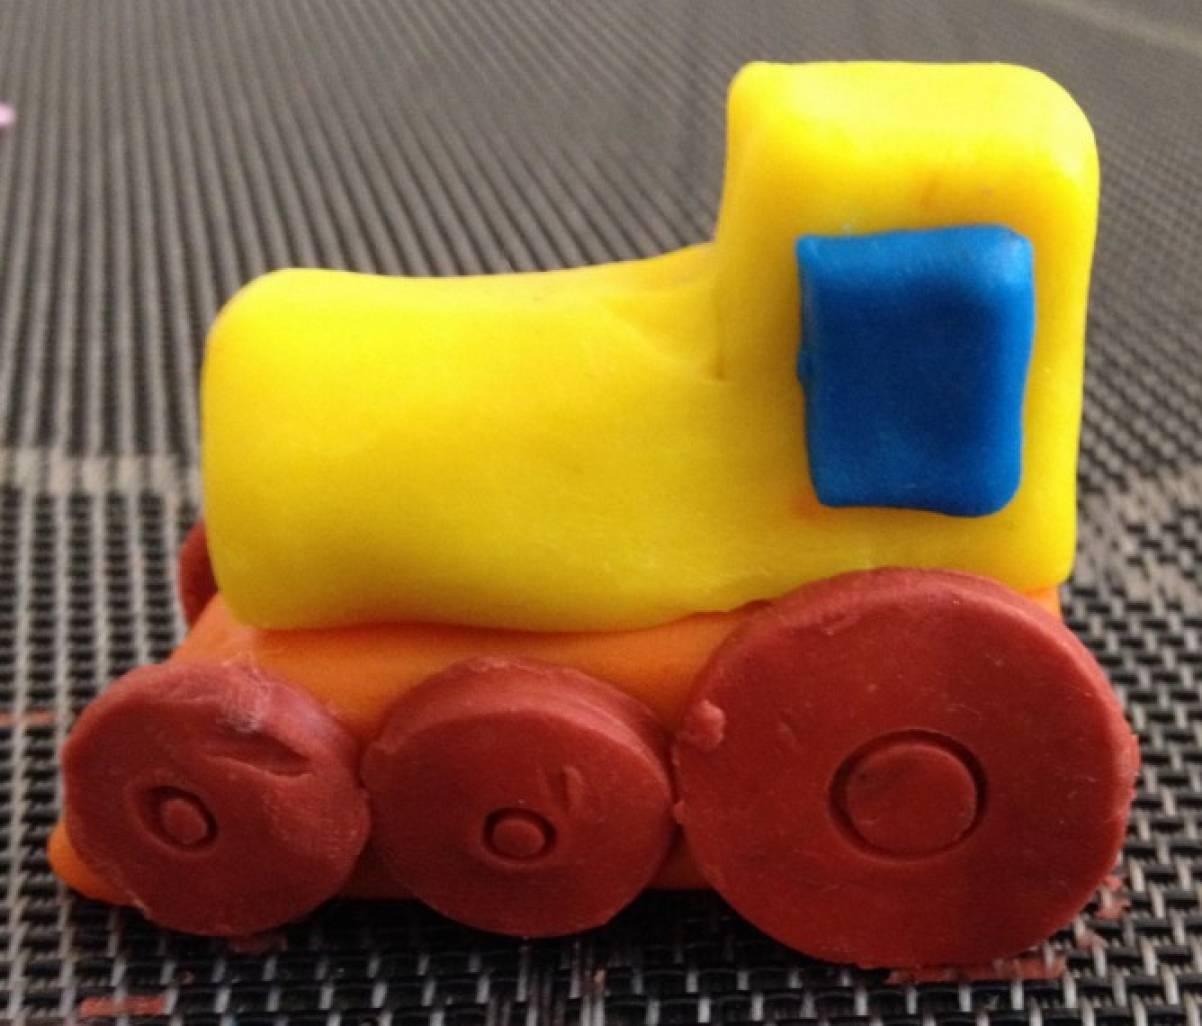 лучи, картинка паровоз из пластилина уход